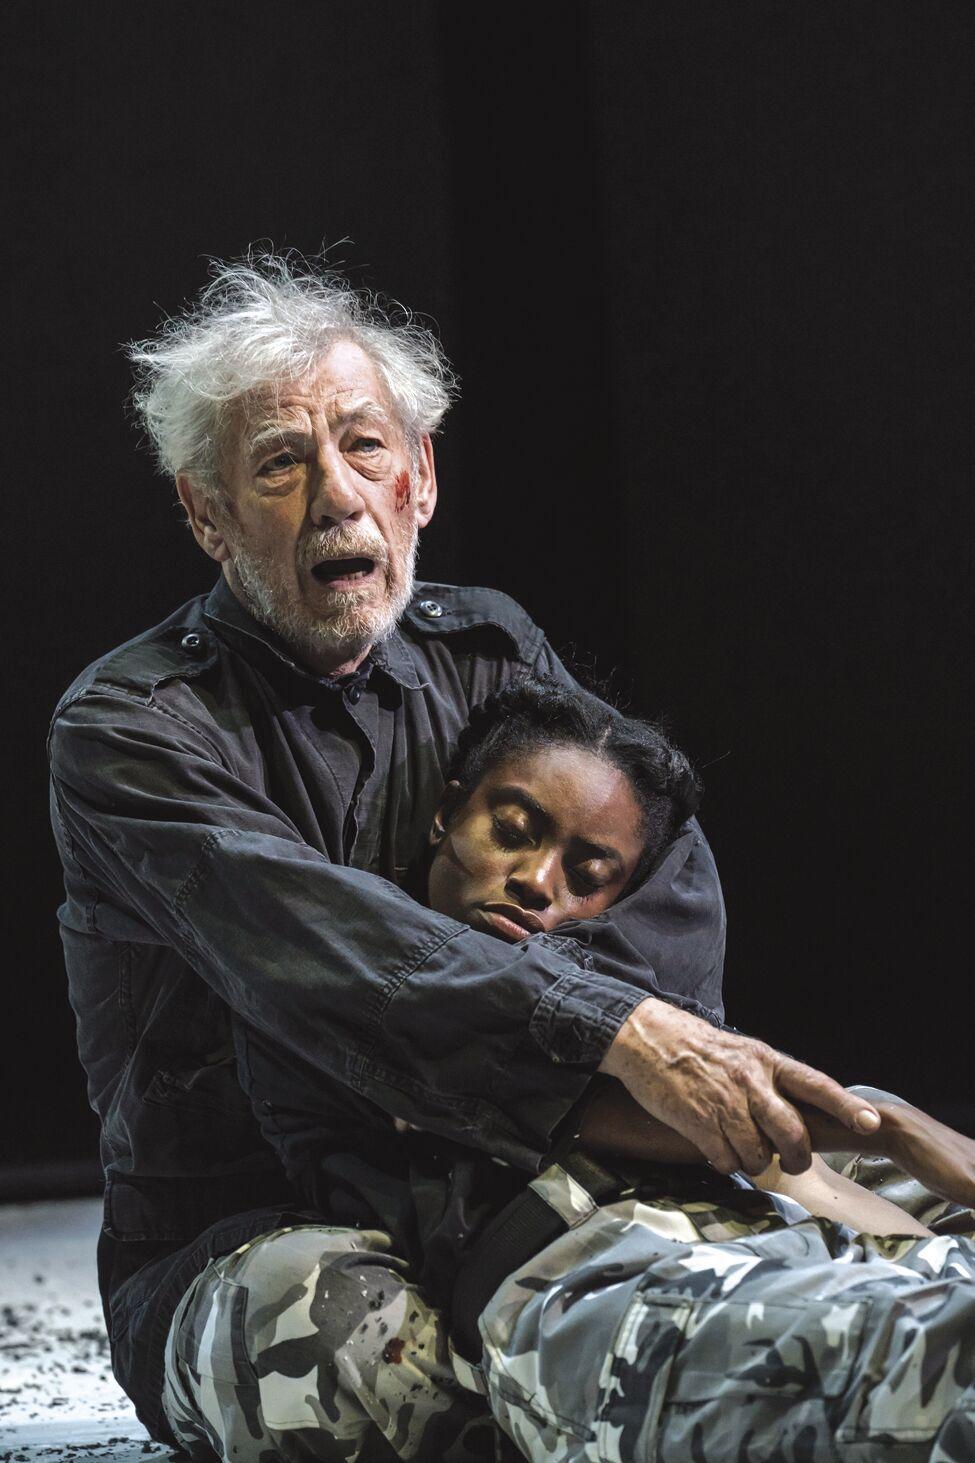 LIV - Bankhead Reopens - NTL 2018 King Lear - Ian McKellen (King Lear) and Anita-Joy Uwajeh (Cordelia) at Duke of Yorks Theatre.tif